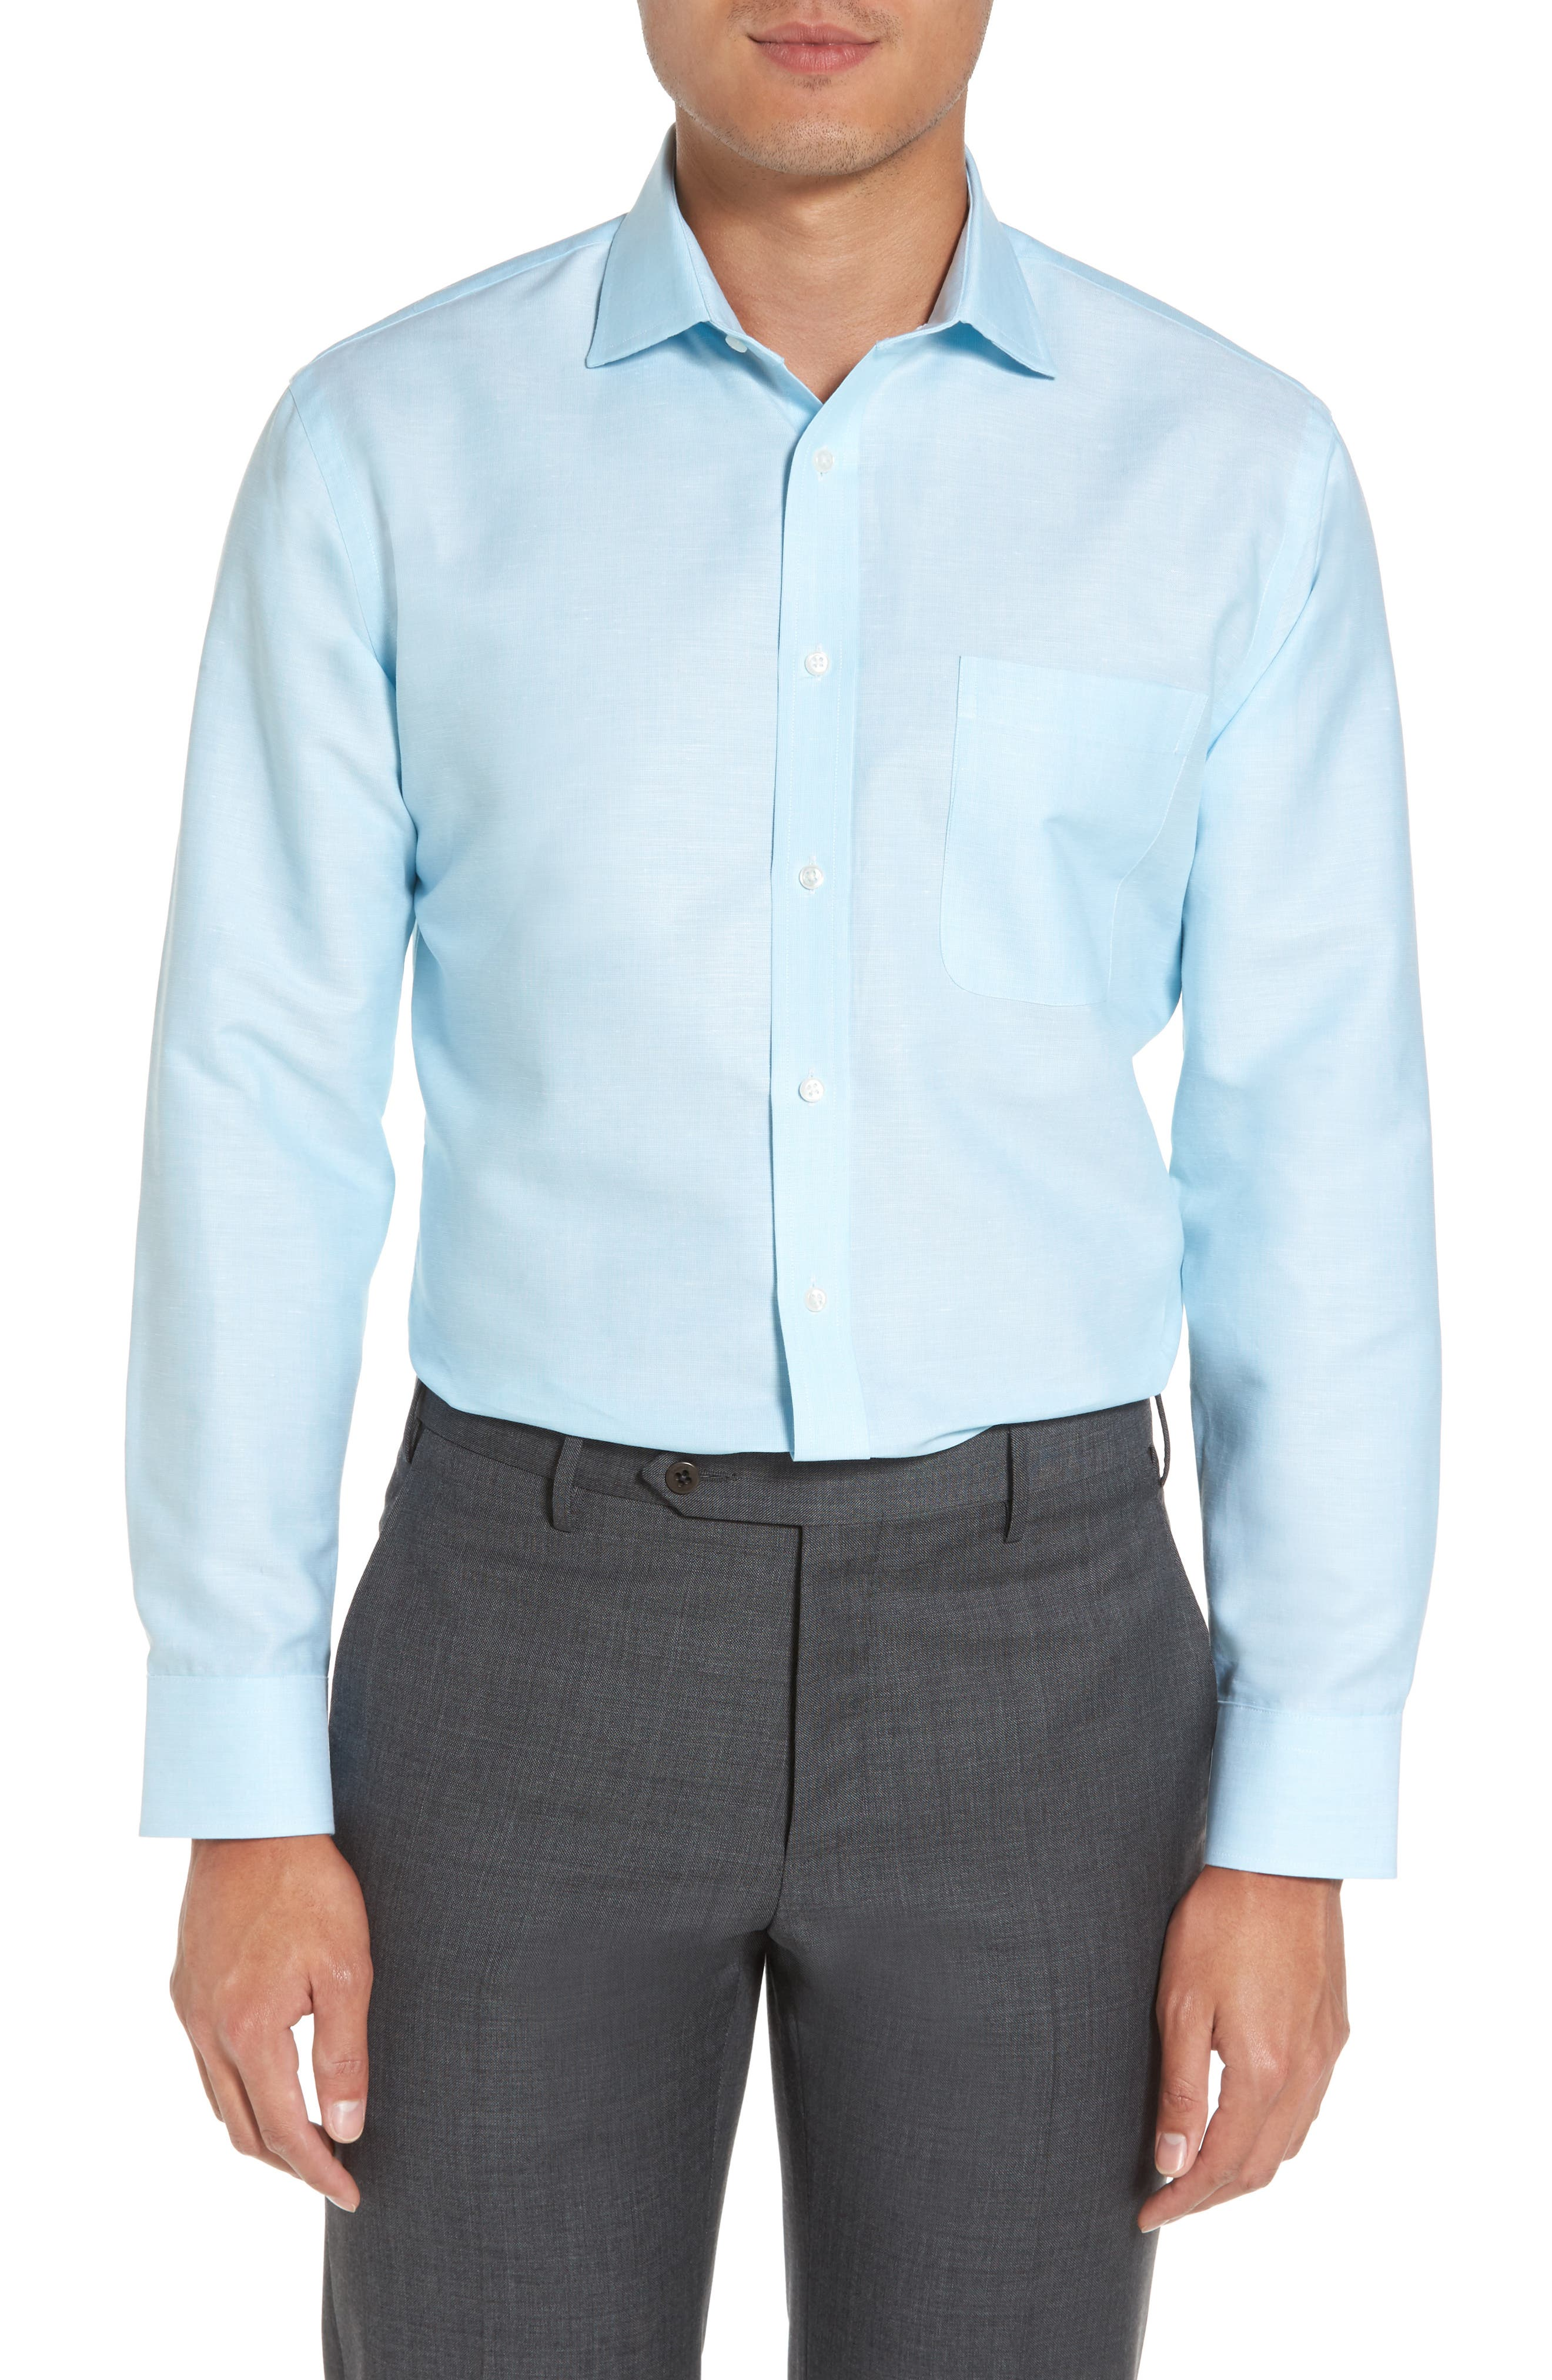 Alternate Image 2  - Nordstrom Men's Shop Trim Fit Solid Linen & Cotton Dress Shirt